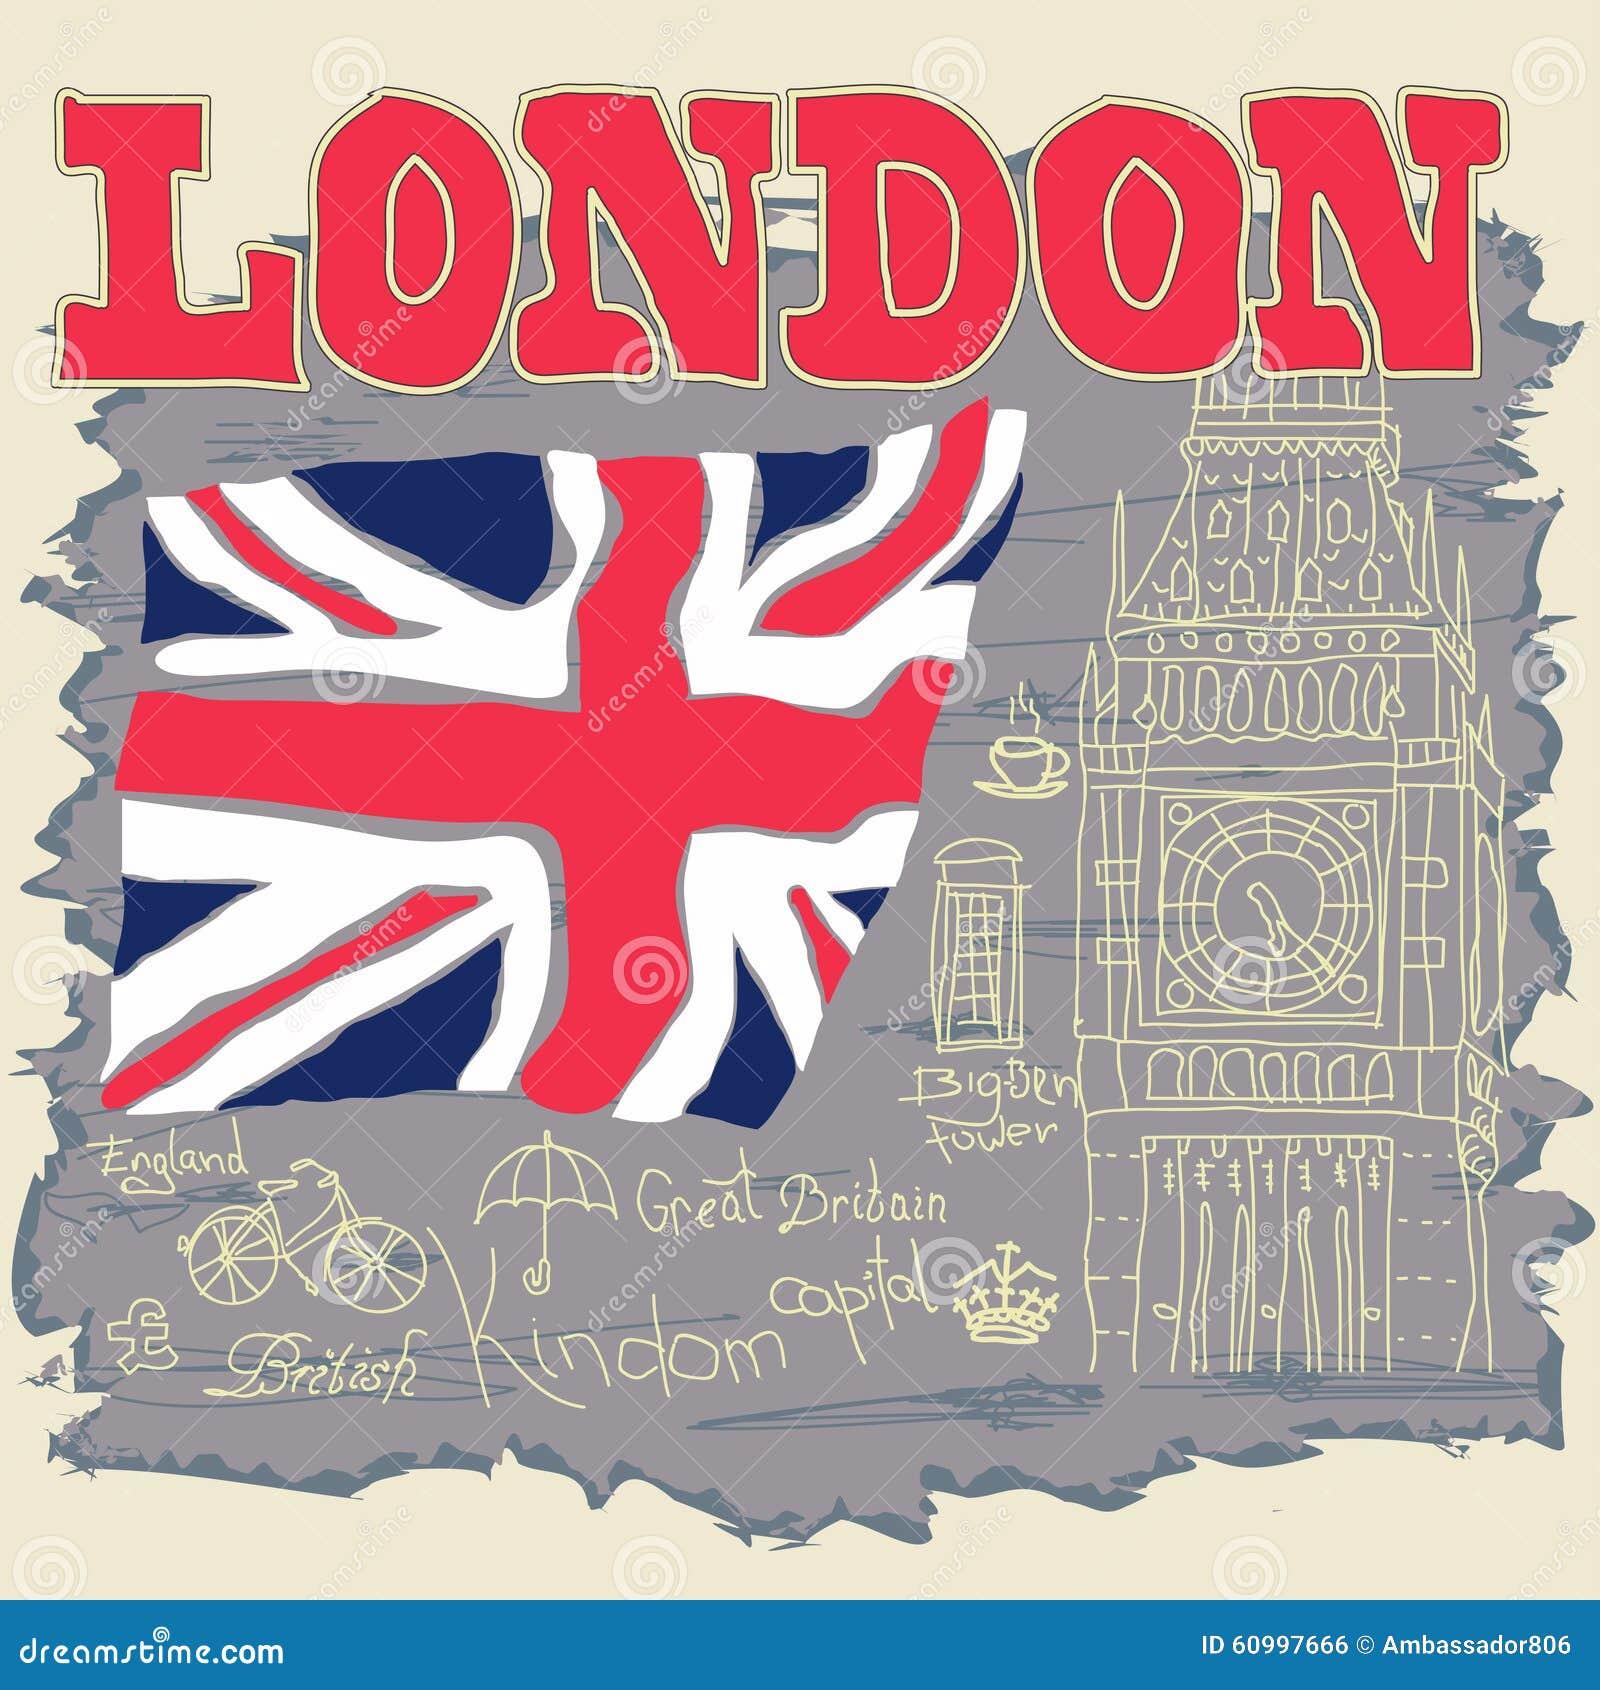 Shirt design london - London Typography Graphics T Shirt Design